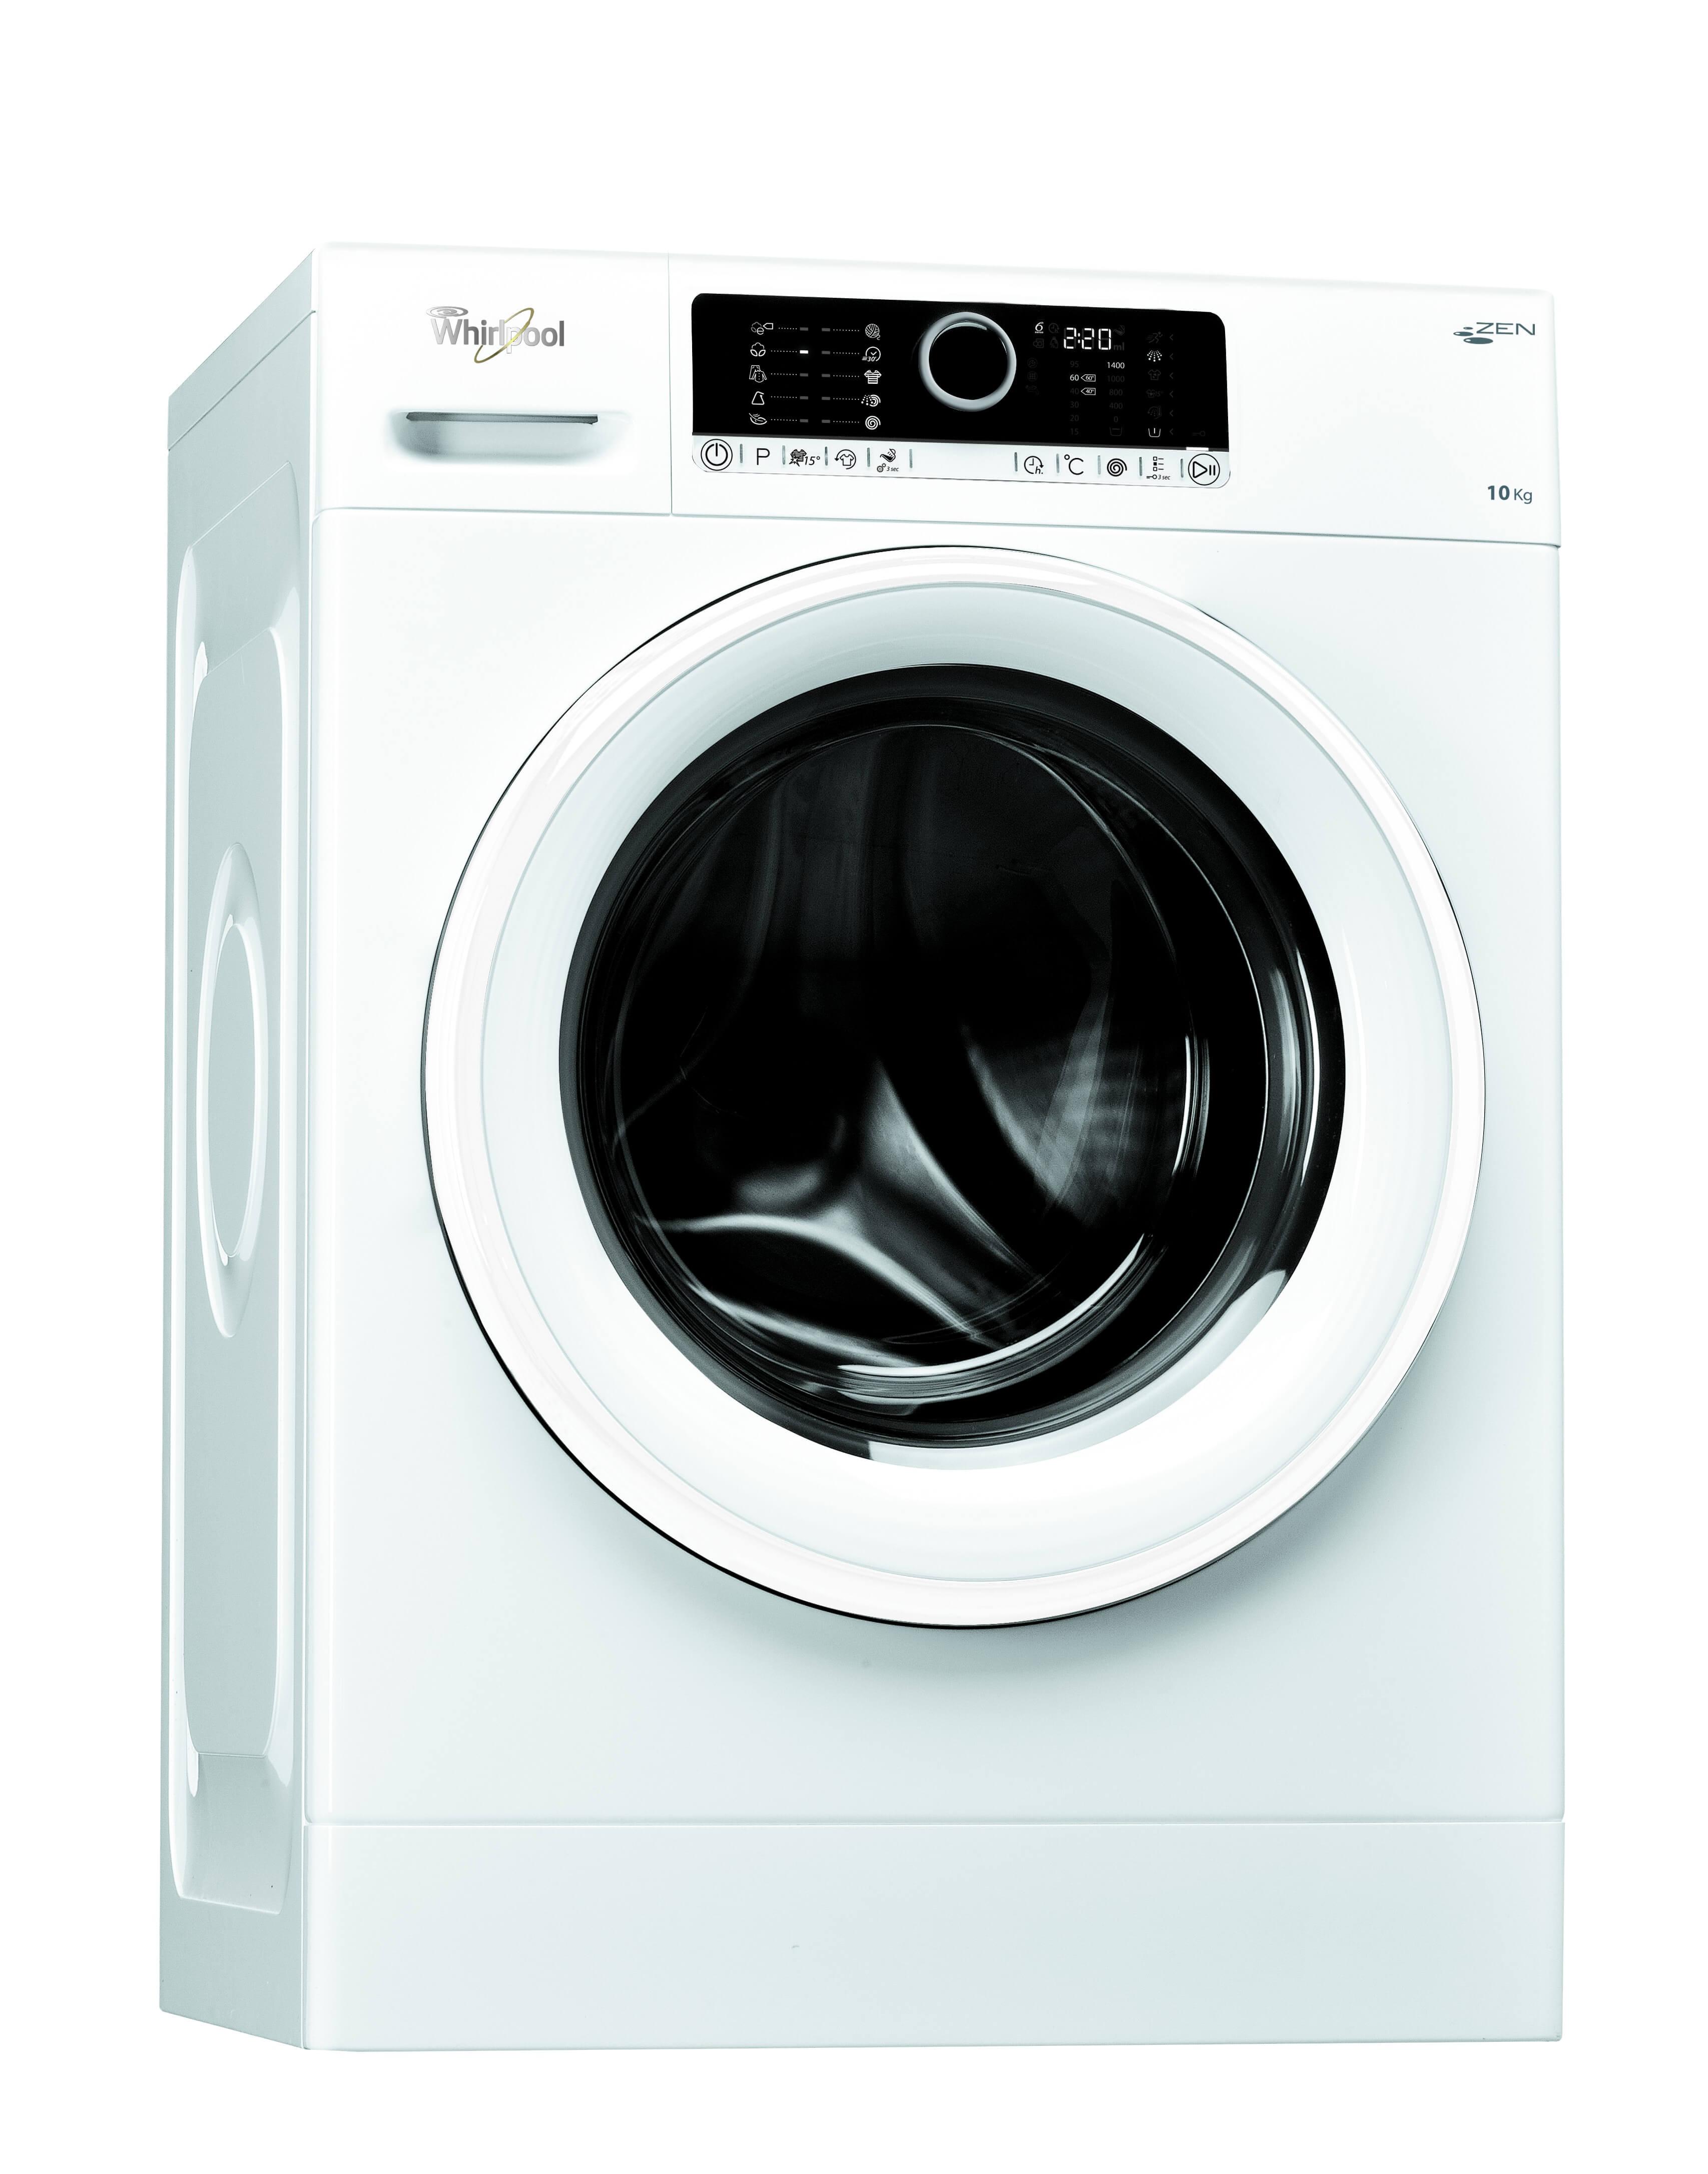 Masina de spalat rufe Whirlpool FSCR 10415, Alb